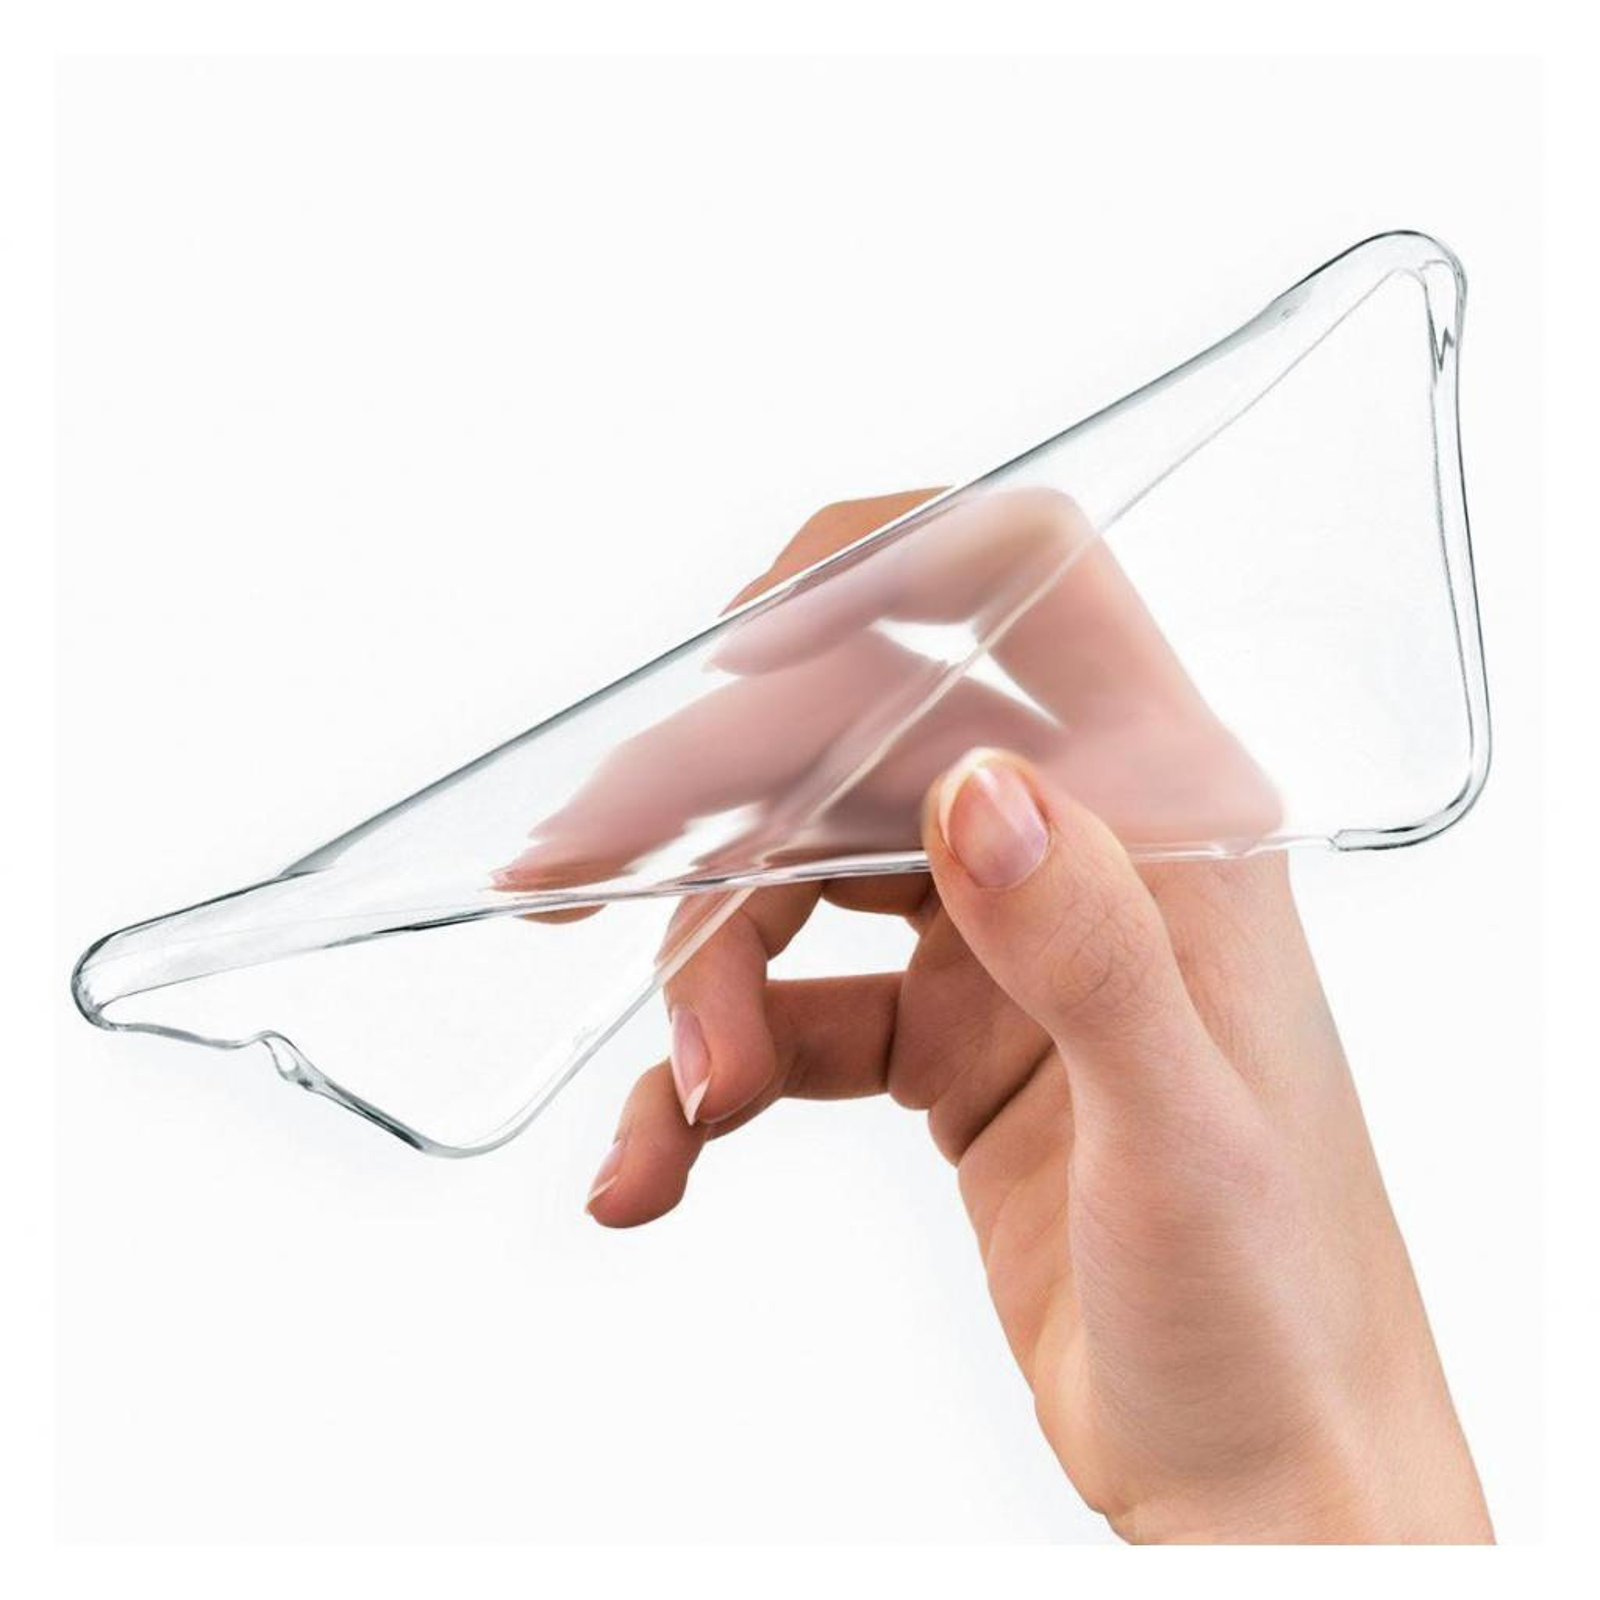 Чехол для моб. телефона SmartCase Huawei Y5 2017 TPU Clear (SC-HY517) изображение 4